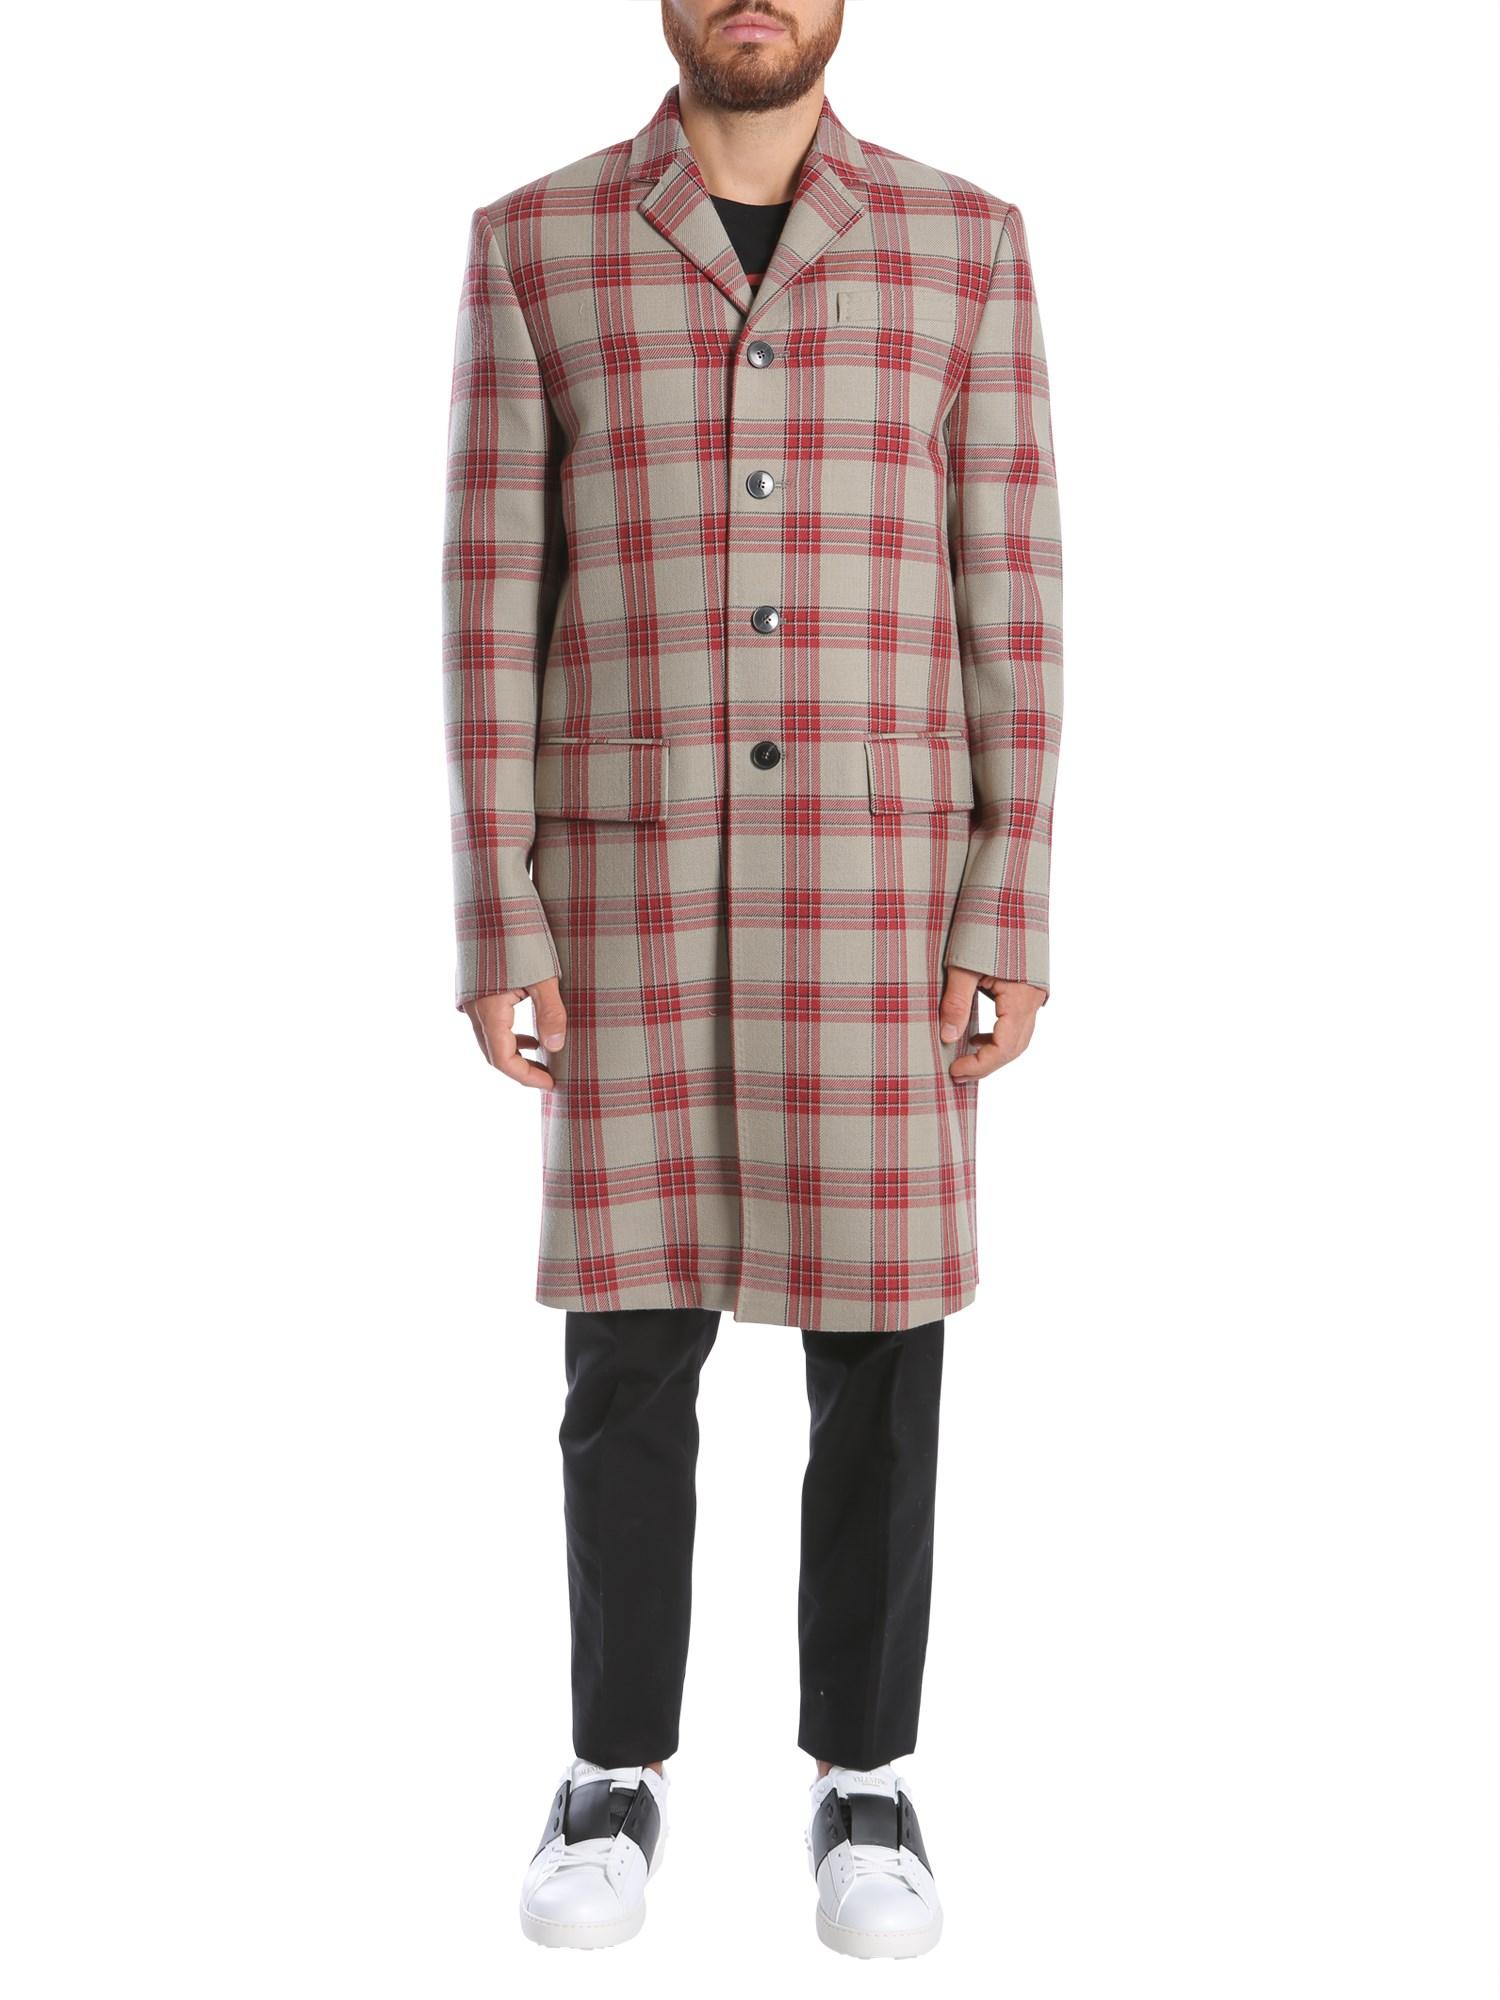 valentino jamie reid embroidered coat